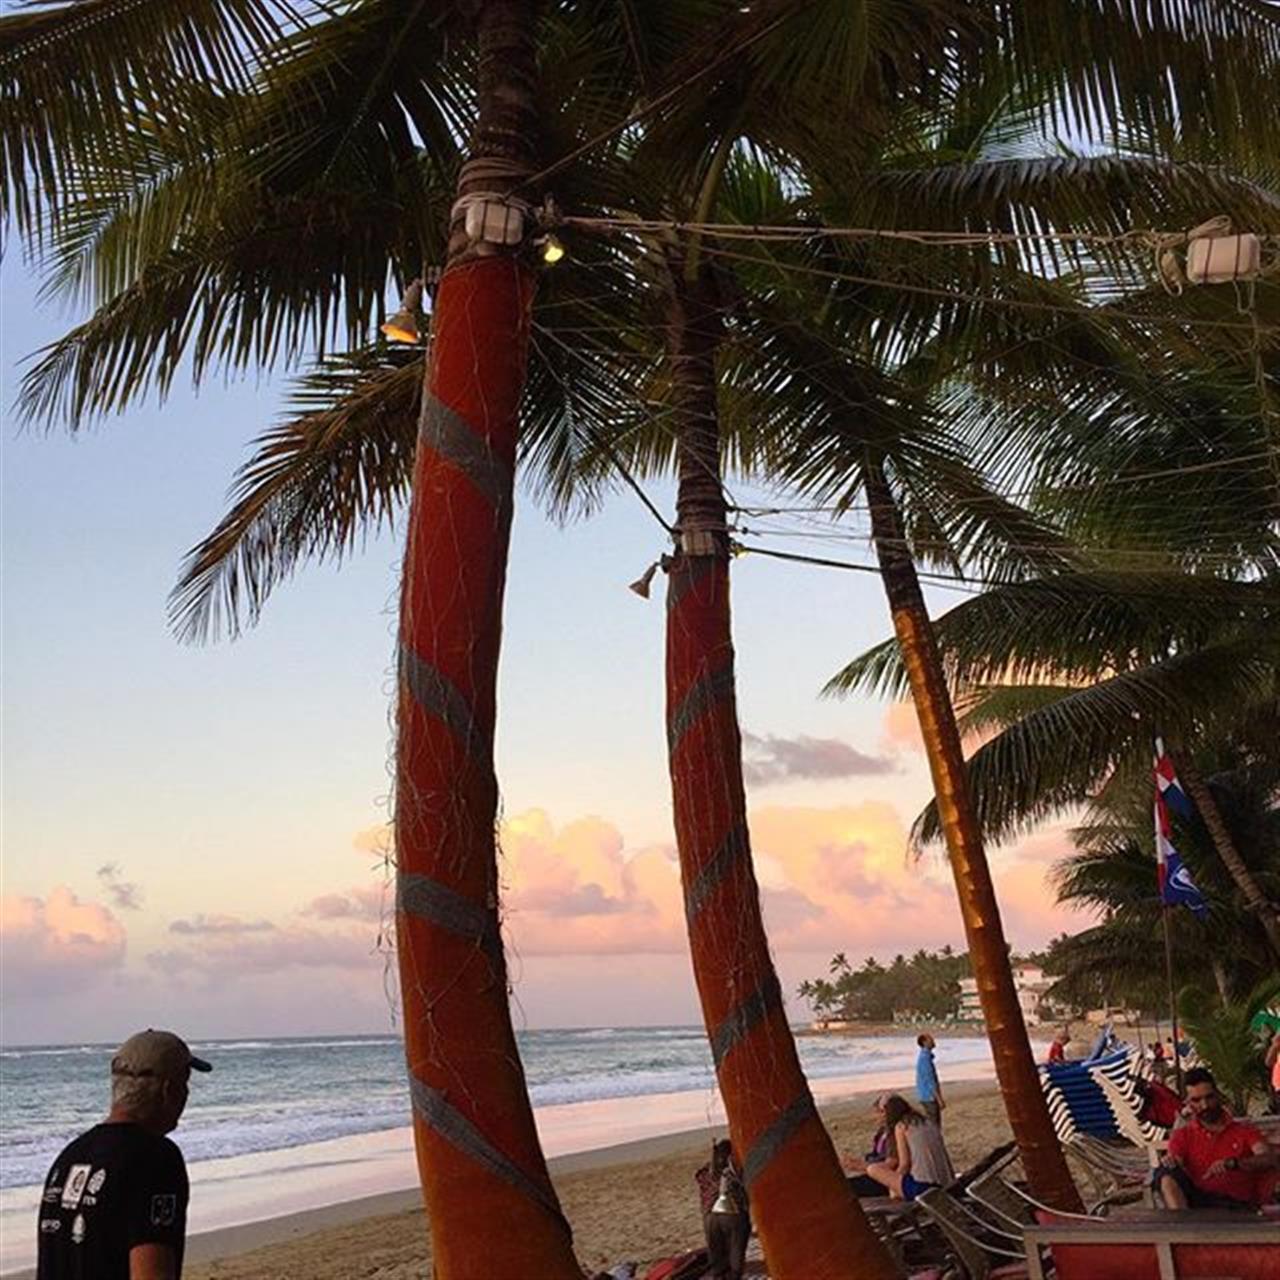 Early evening in Cabarete! #DominicanRepublic #selectcaribbean #leadingrelocal #beach #eveningsky #caribbeanlife #caribbeanisland #cocktailhour www.selectcaribbean.com